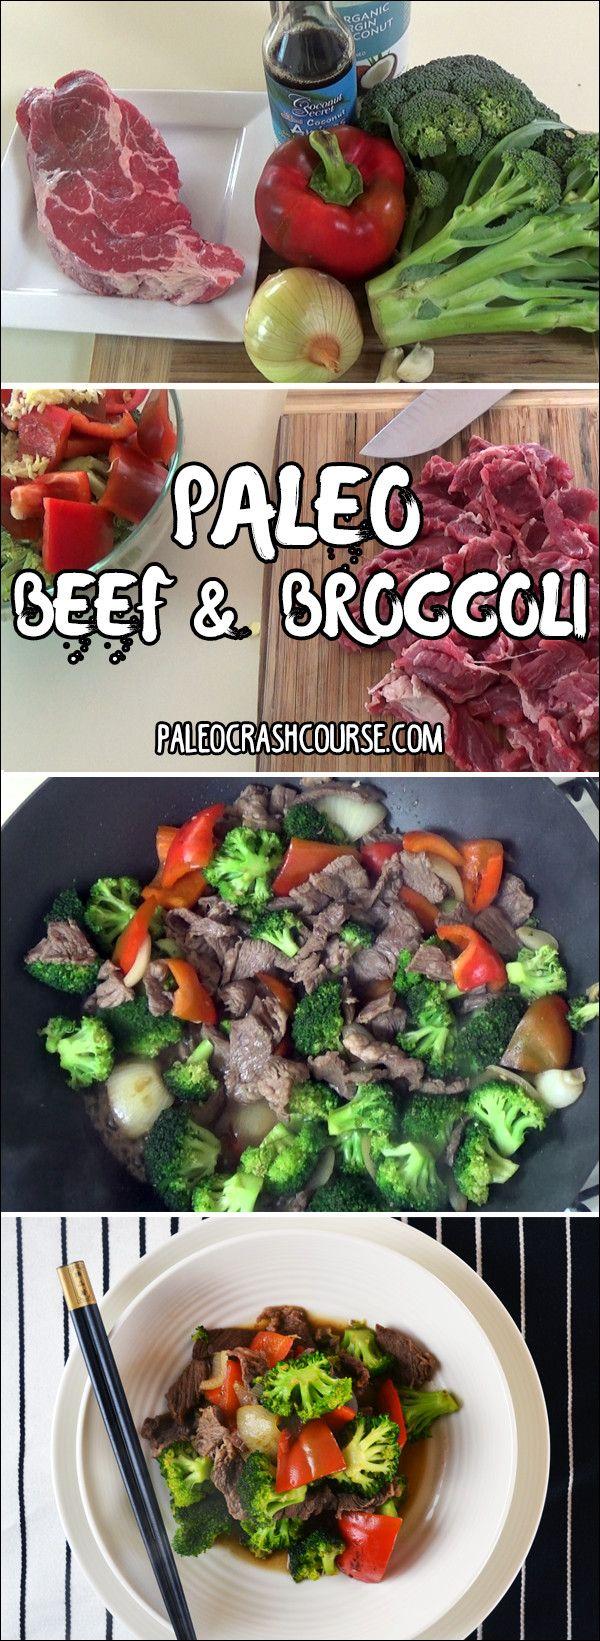 A yummy paleo friendly beef and broccoli stir fry!   http://paleocrashcourse.com/paleo-beef-and-broccoli/